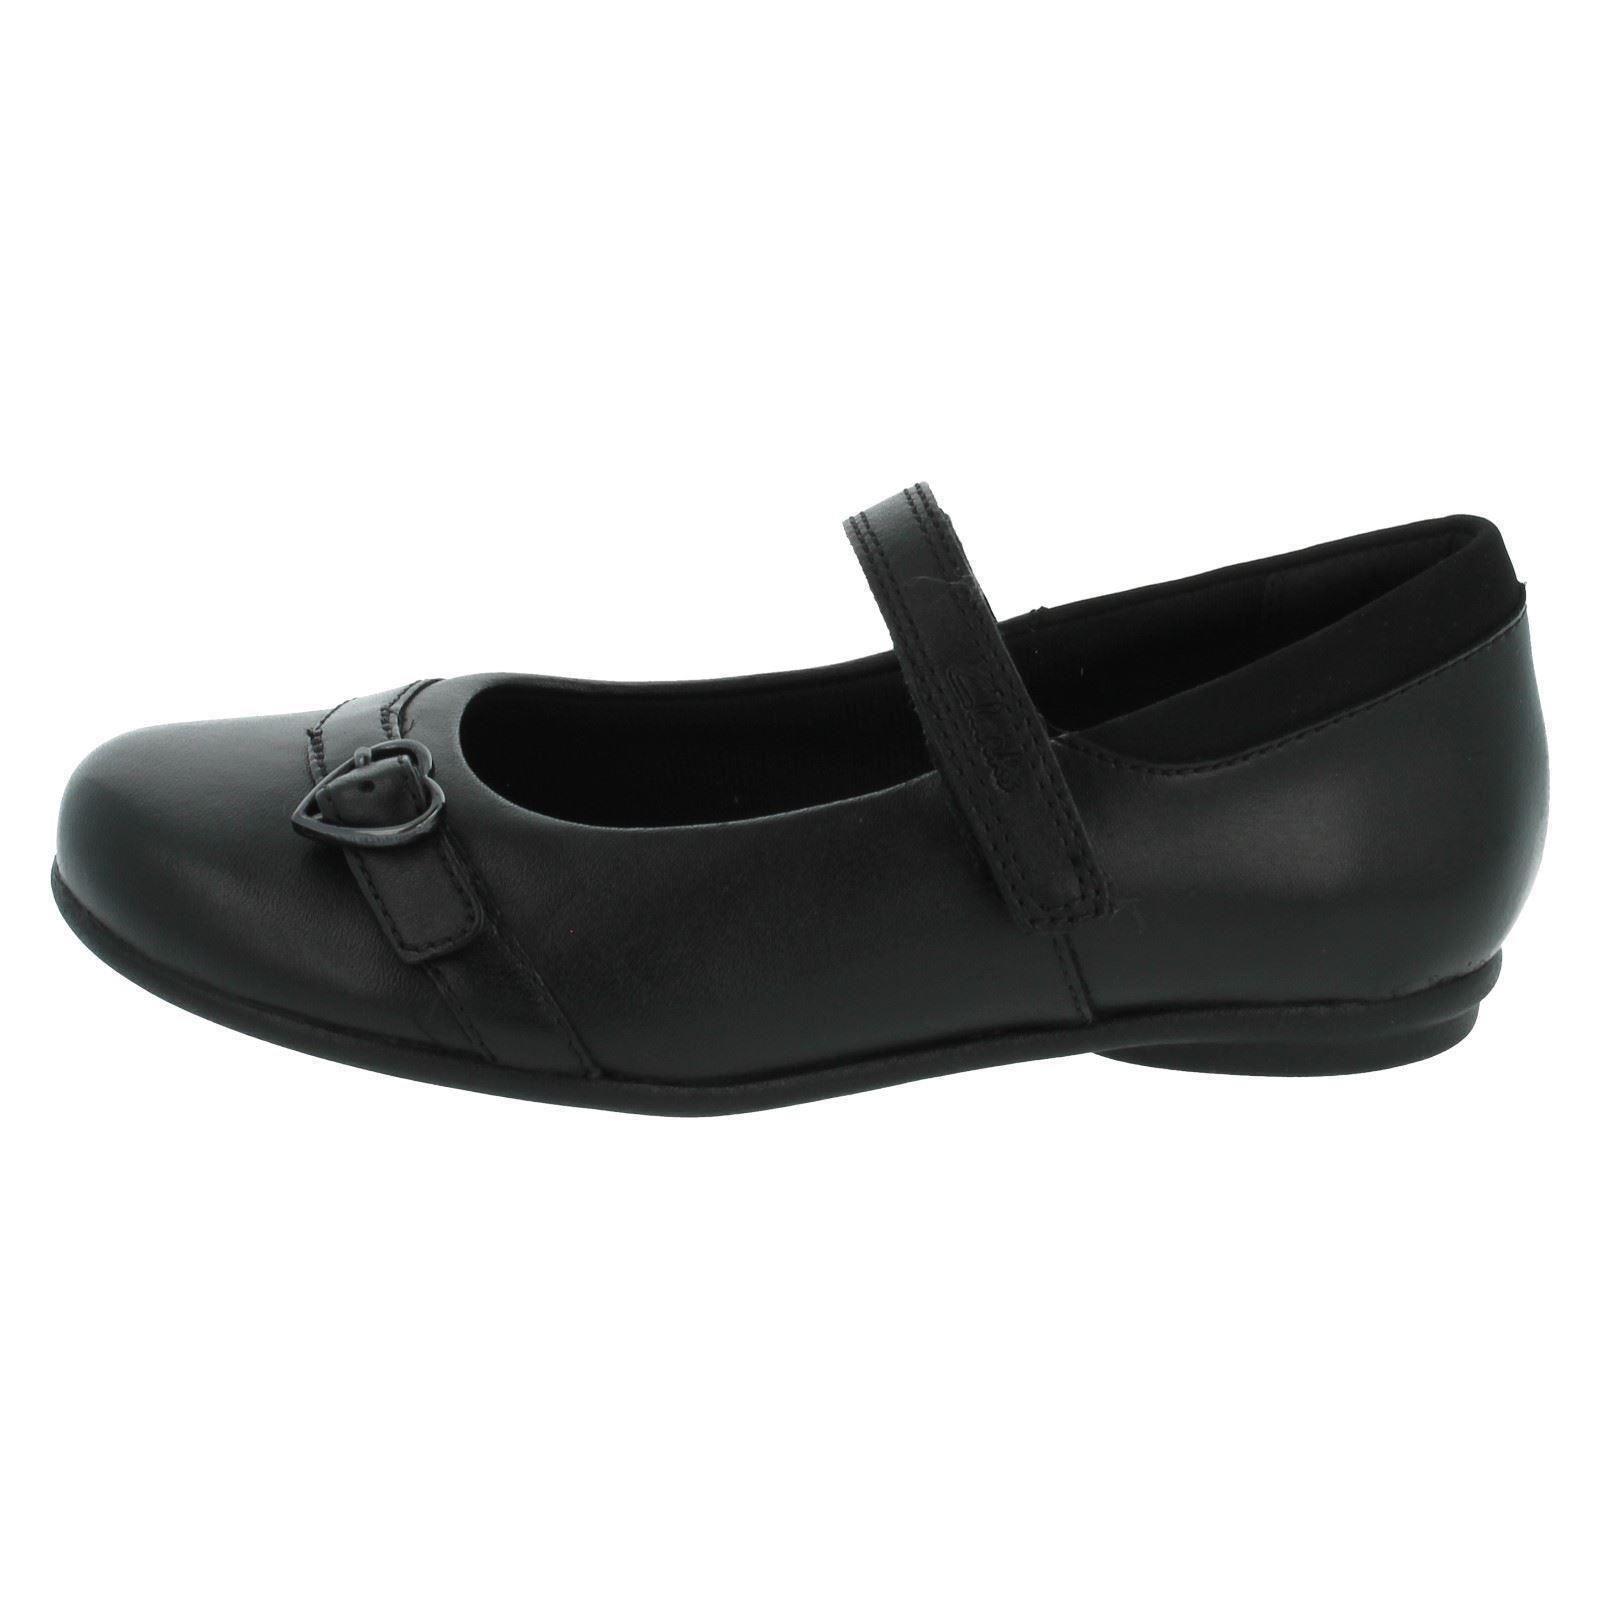 Girls Clarks Shoes Tasha Bay